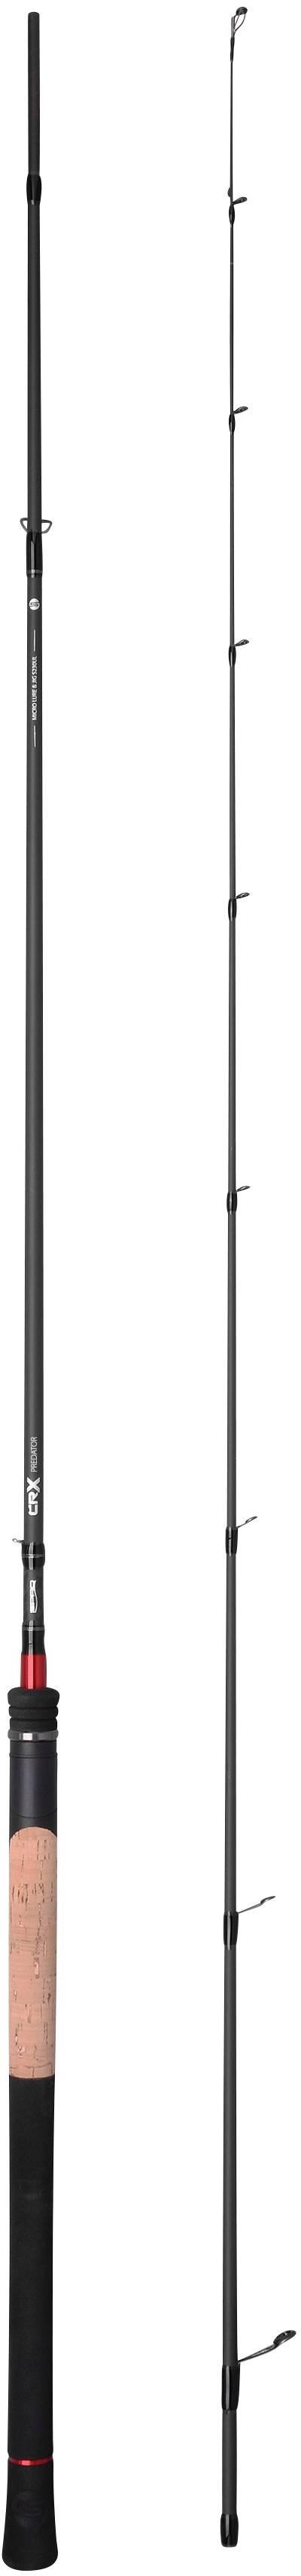 Spro CRX Micro Lure /& Jig Ultra Light UL 2,10m 2,30m 2,50m WG 3-12g Carbon NEW